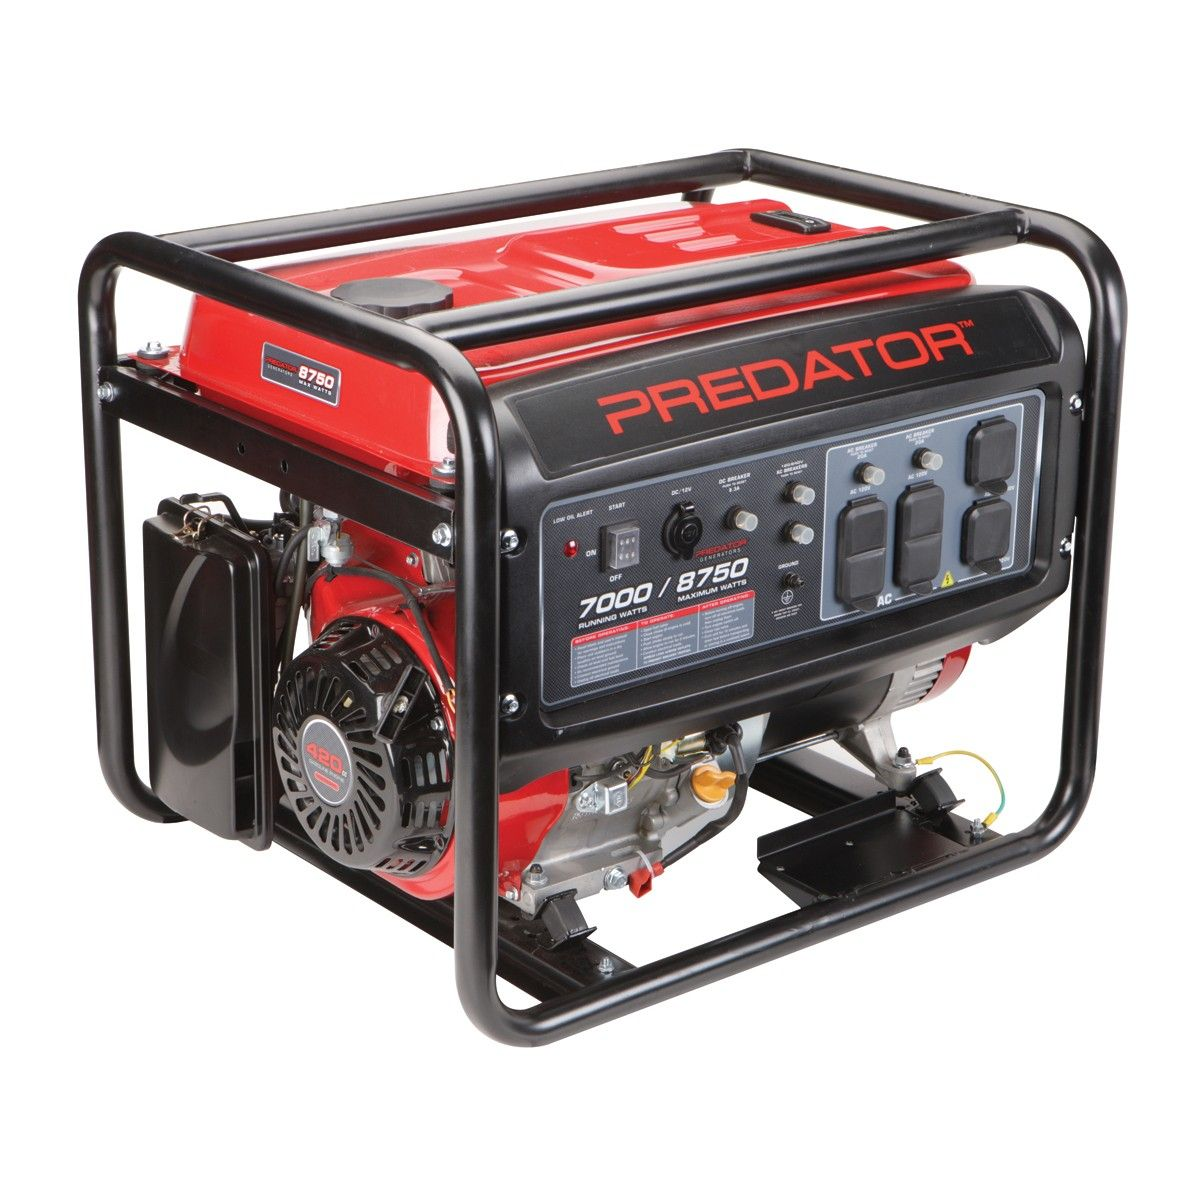 420cc, 8750 Watts Max/7000 Watts Rated Portable Generator